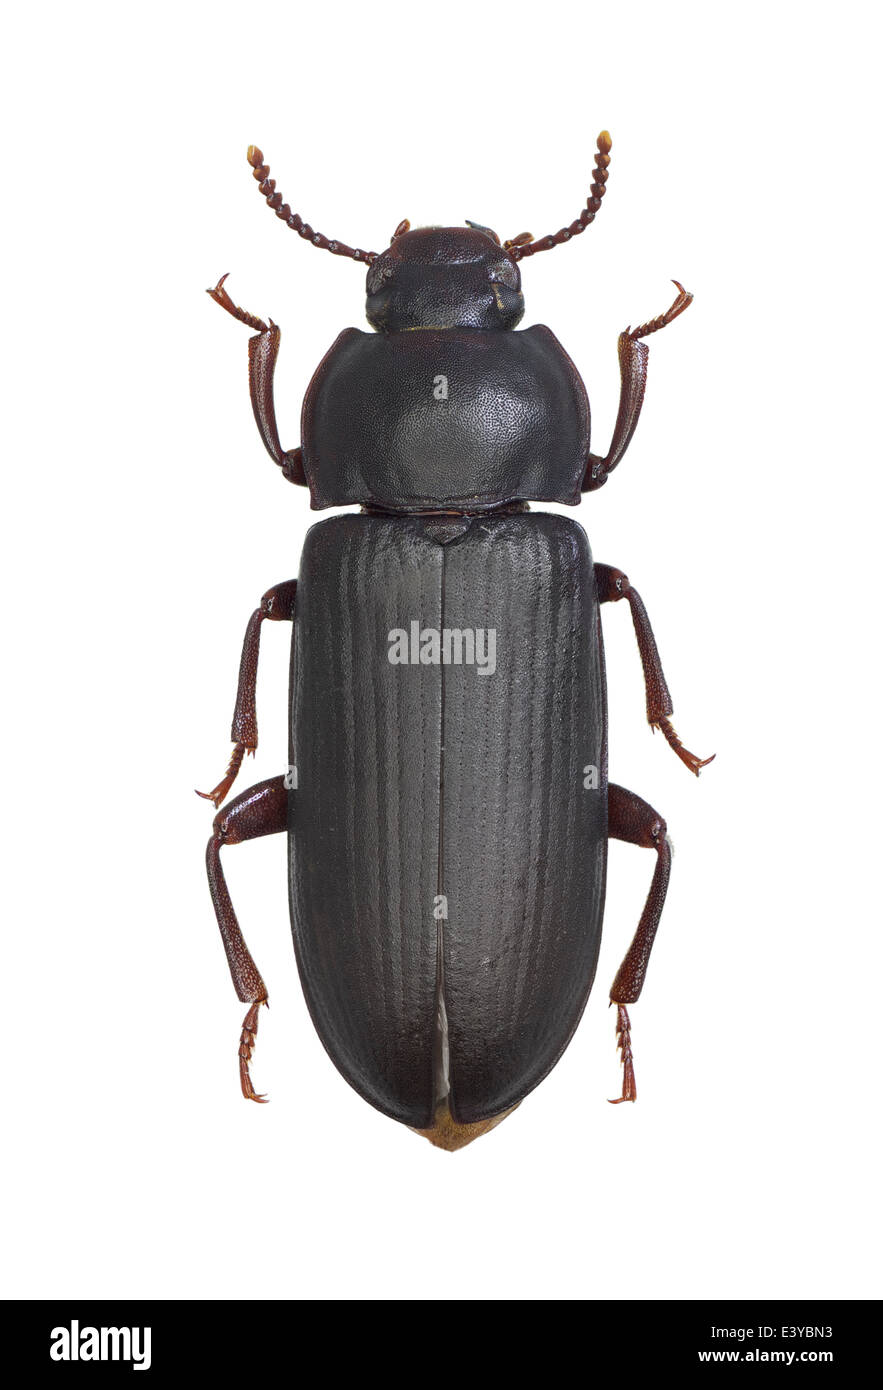 Fine Darkling Beetle Anatomy Image - Human Anatomy Images ...